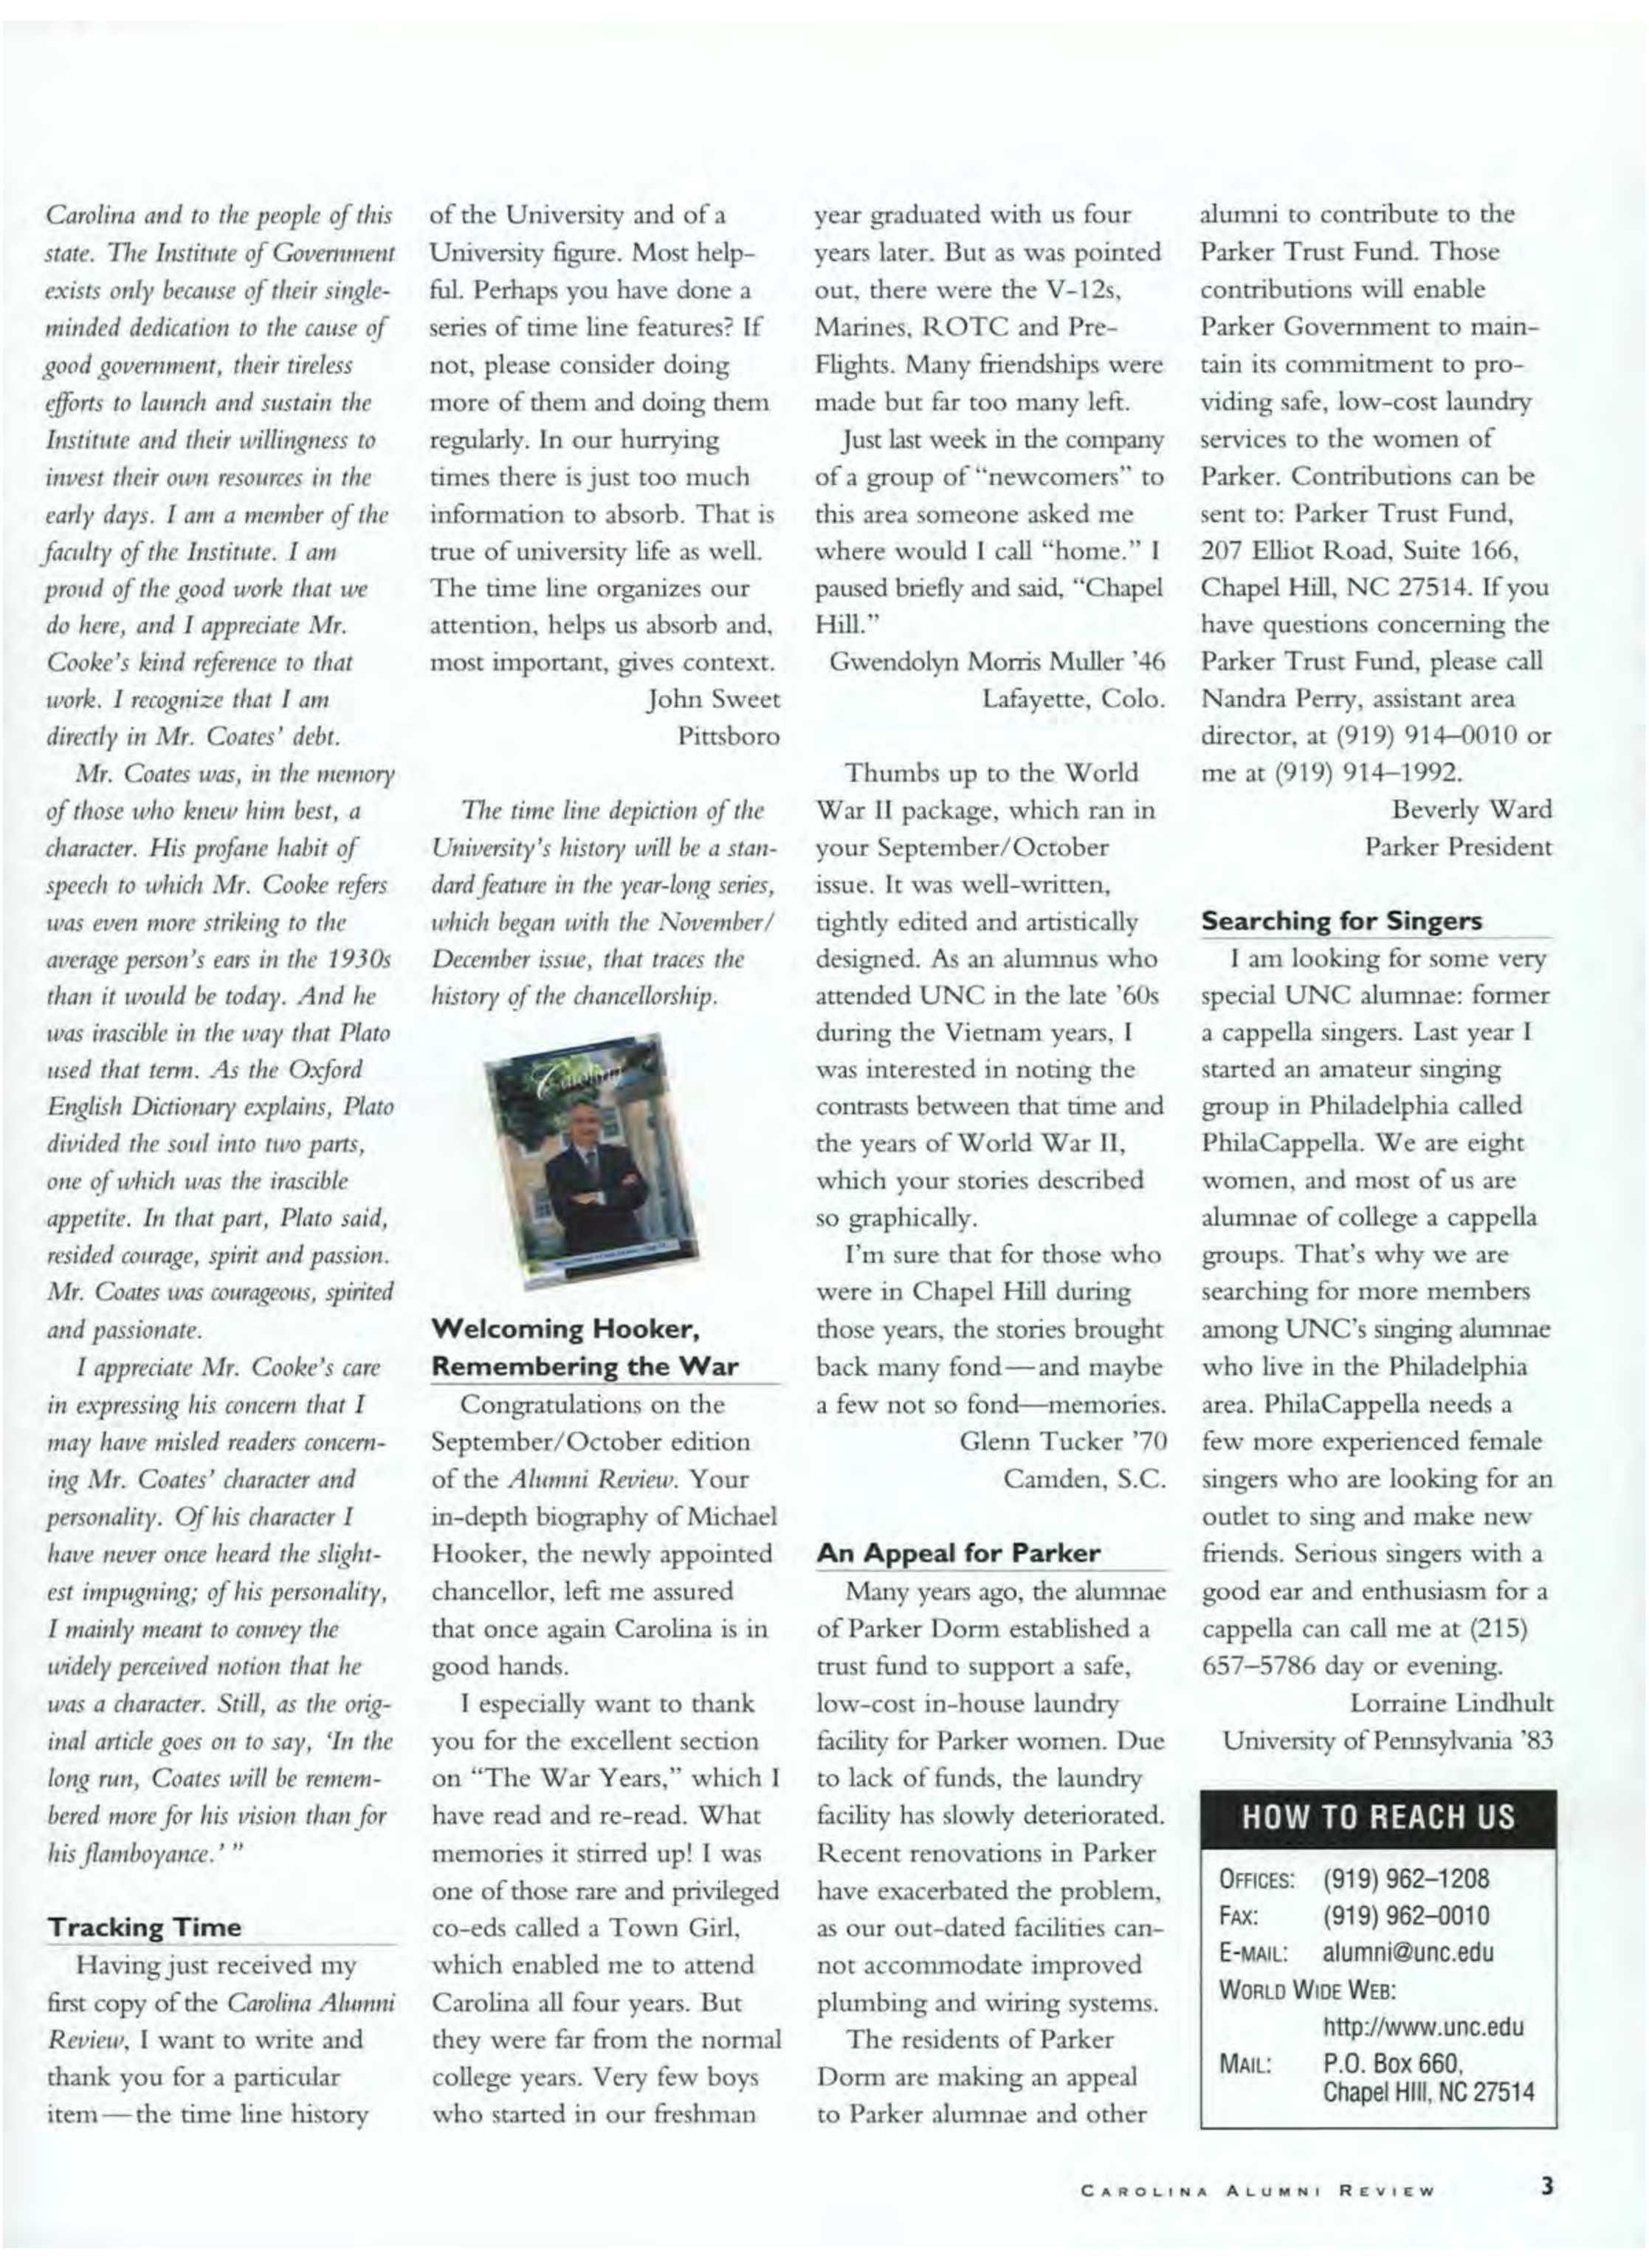 Carolina Alumni Review - January/February 2000 - page 3